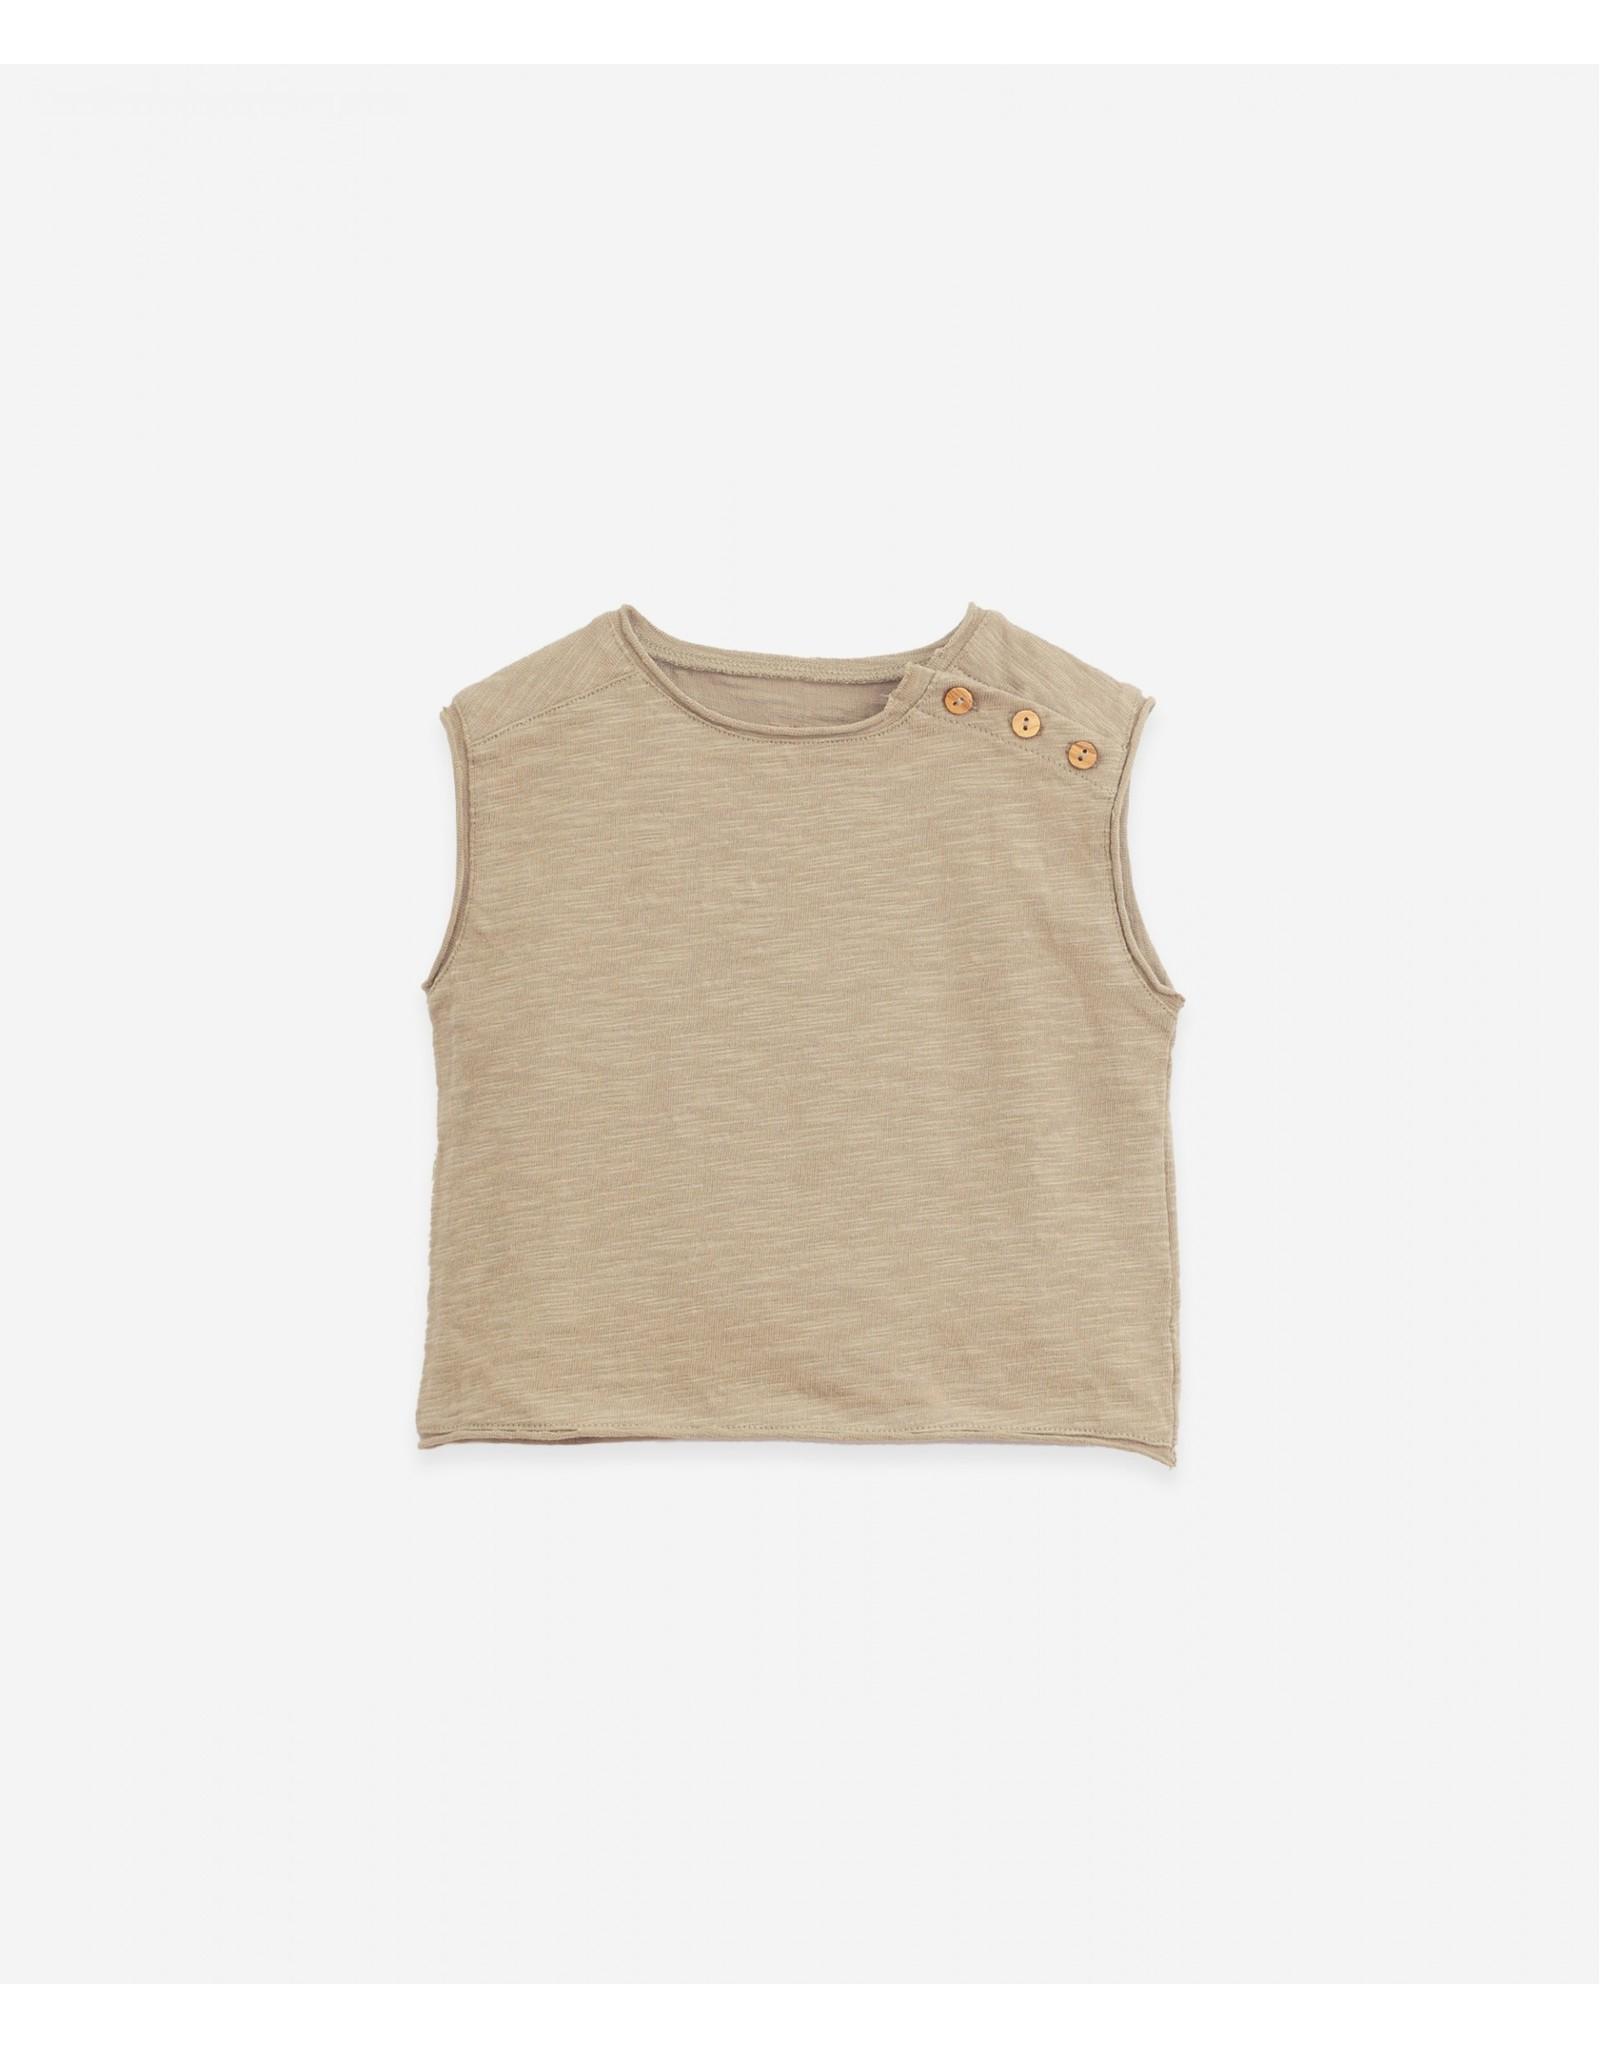 Play Up Play Up Organic Cotton Sleeveless T-shirt Joao